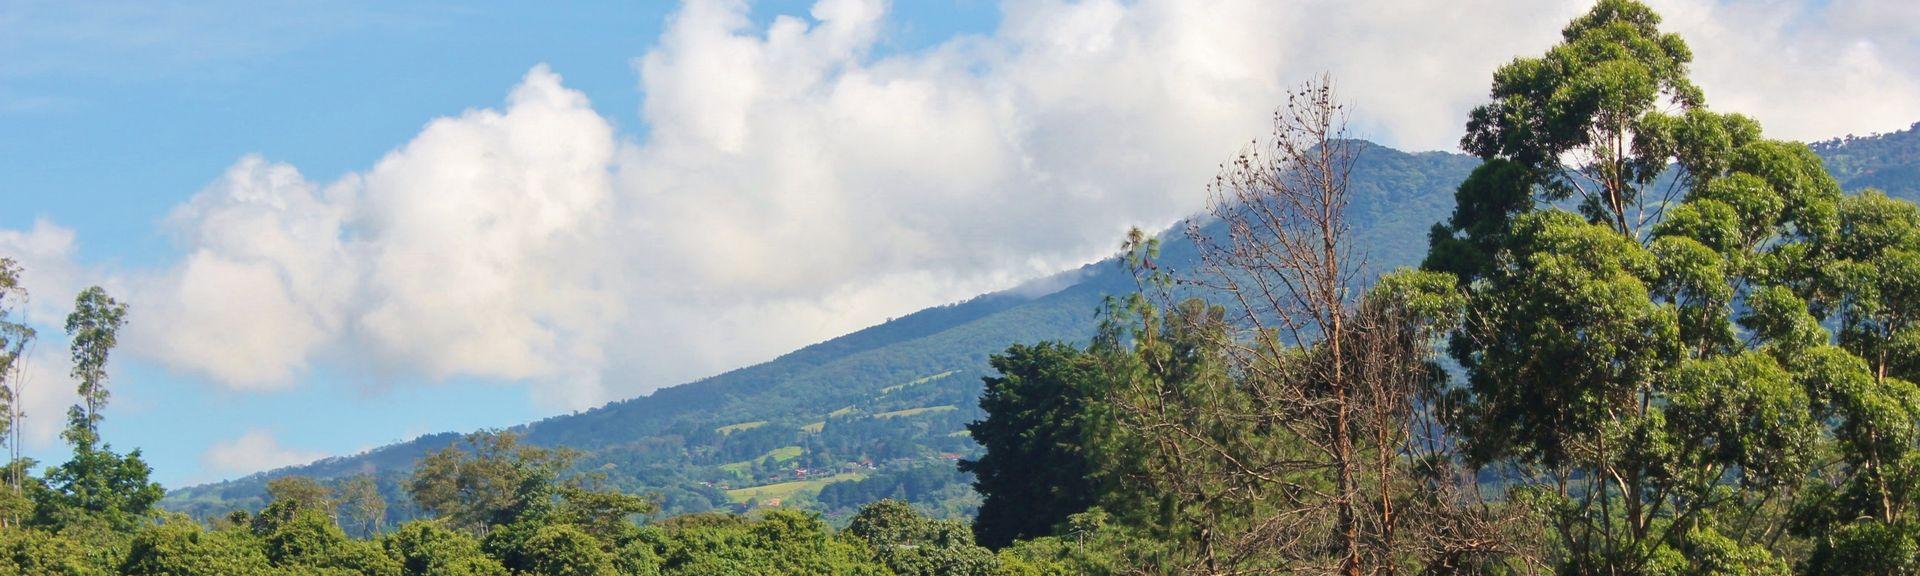 Kanton Alajuela, Alajuela (provincie), Costa Rica